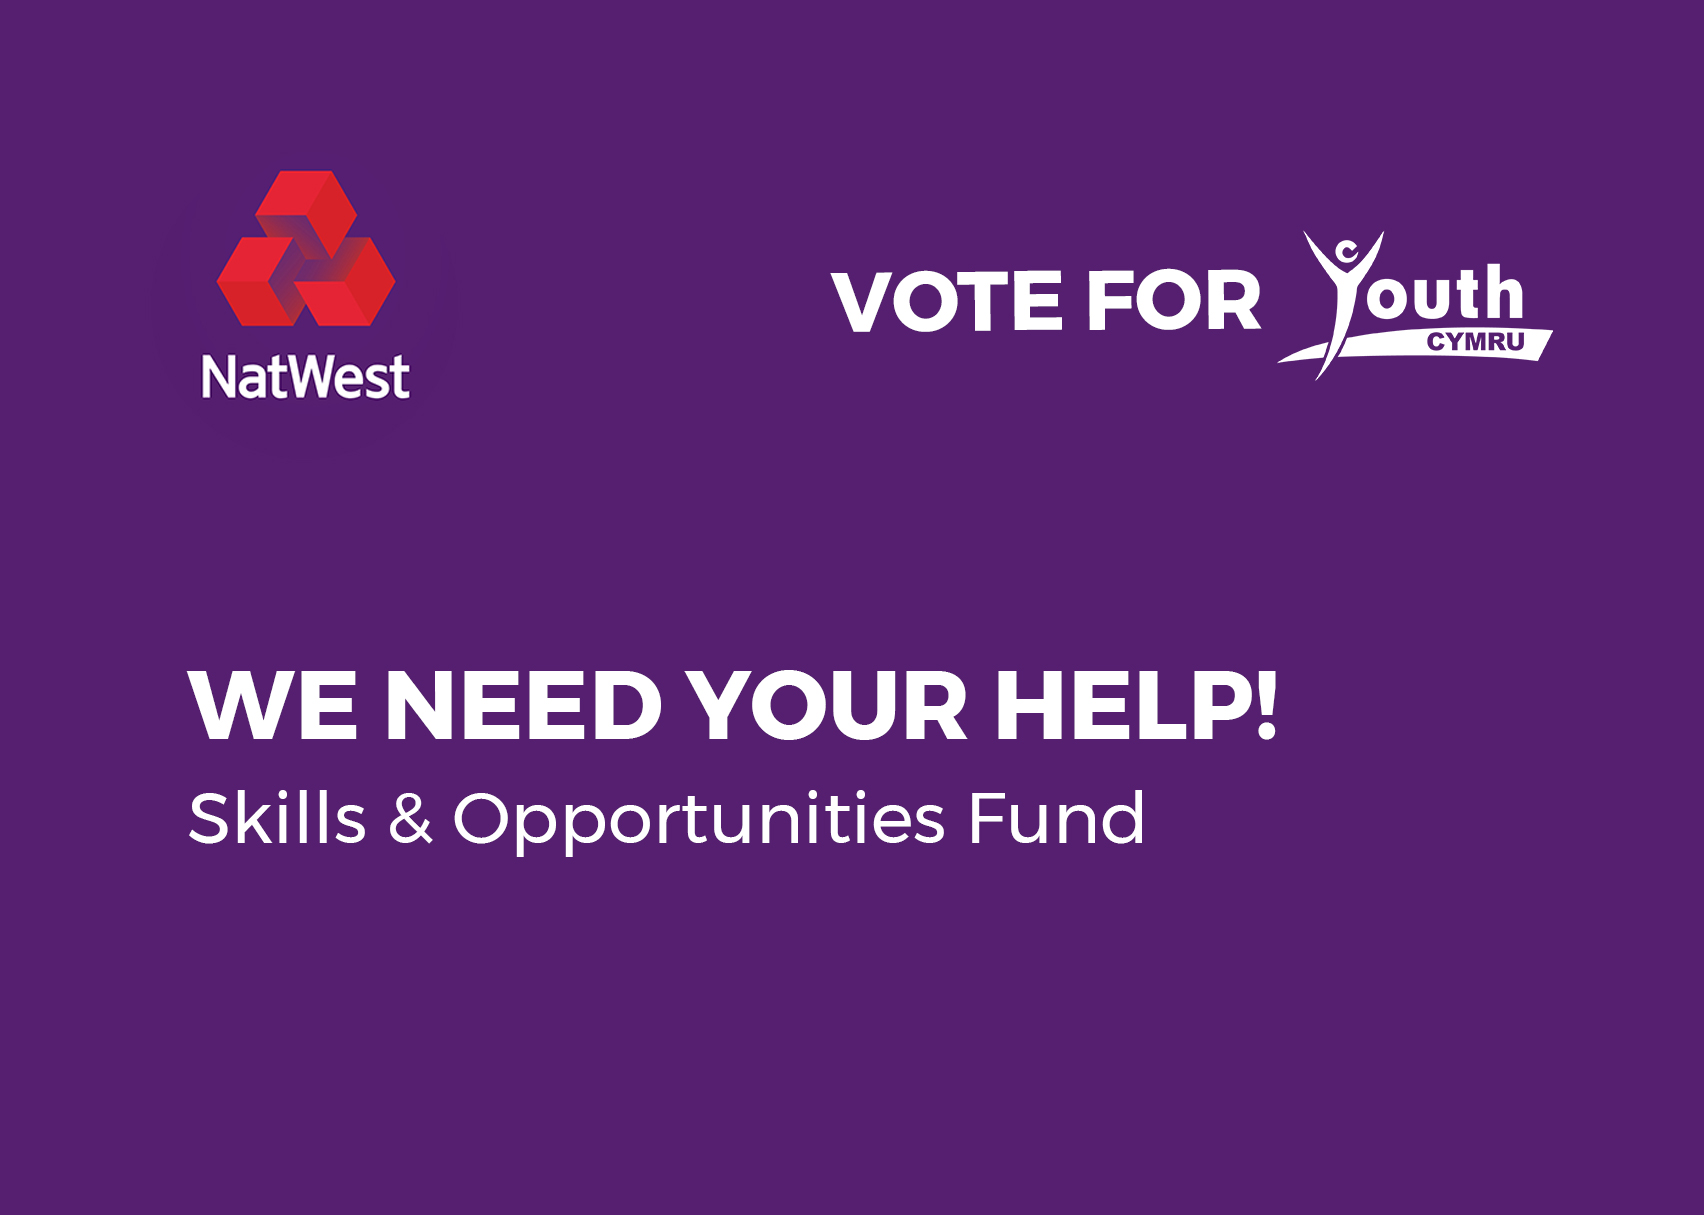 NatWest: Skills & Opportunities Fund